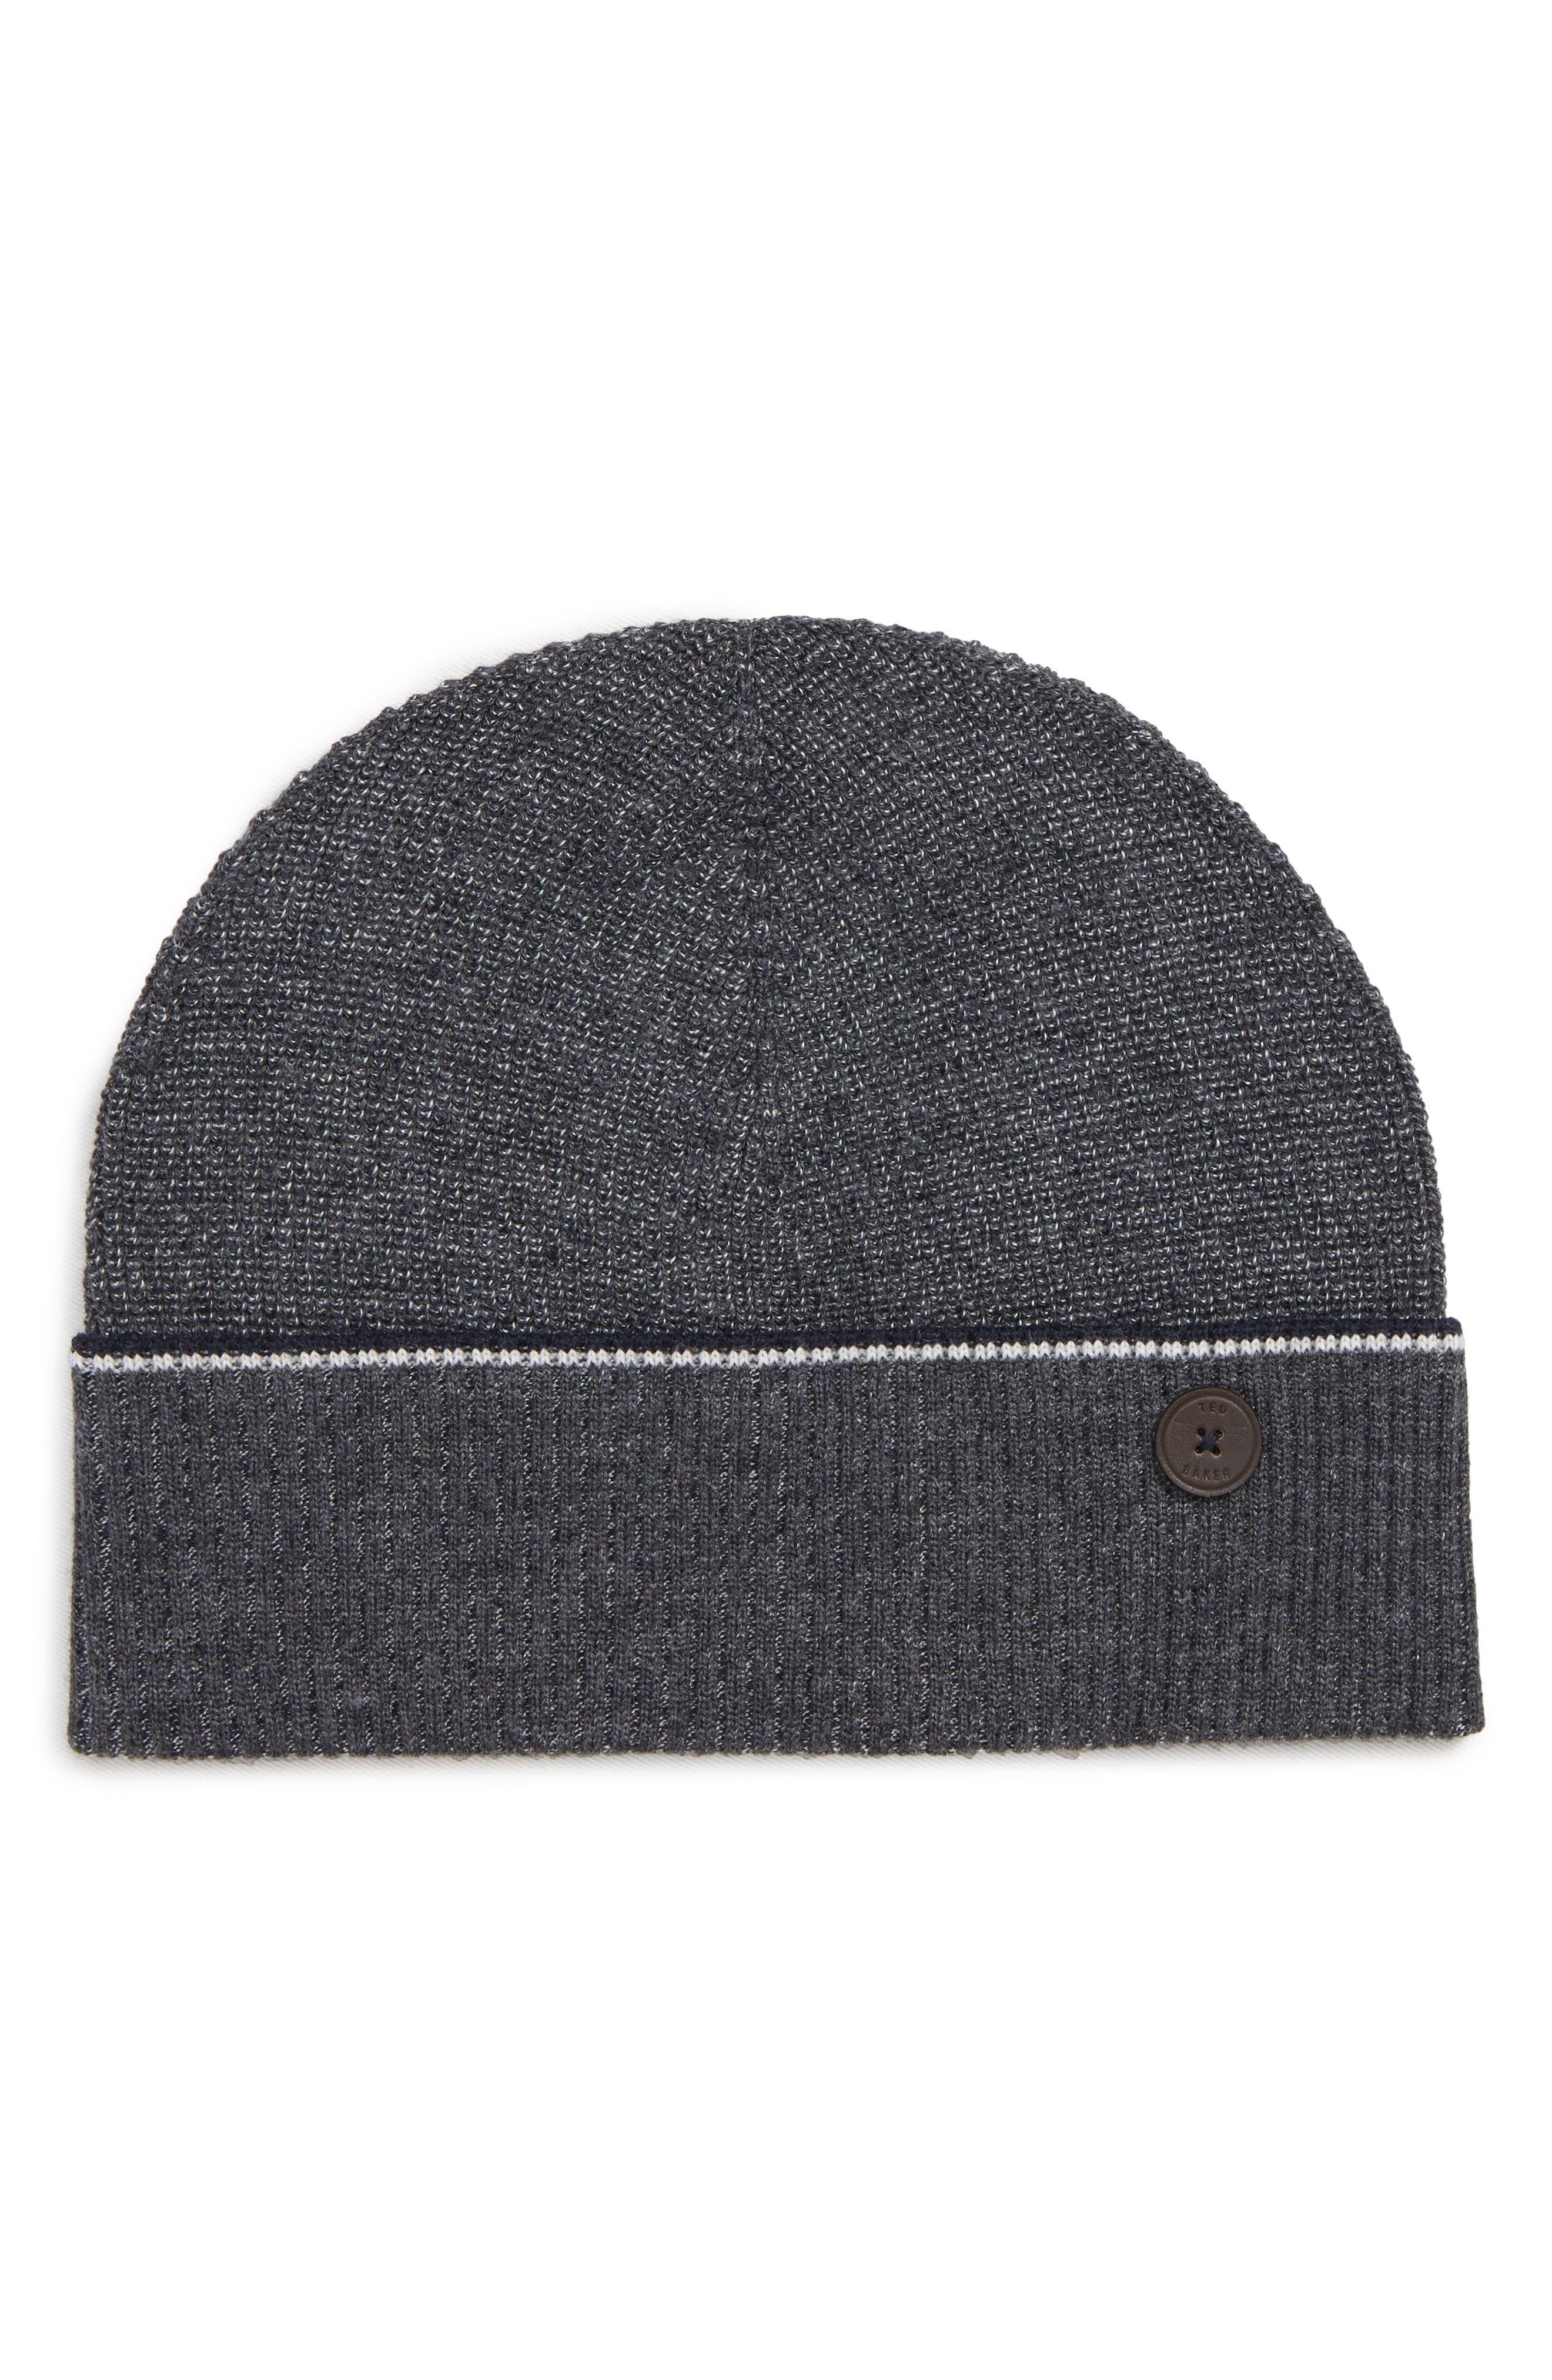 release date infant jordan winter hats amazon b2198 445c5 206f61c17cb